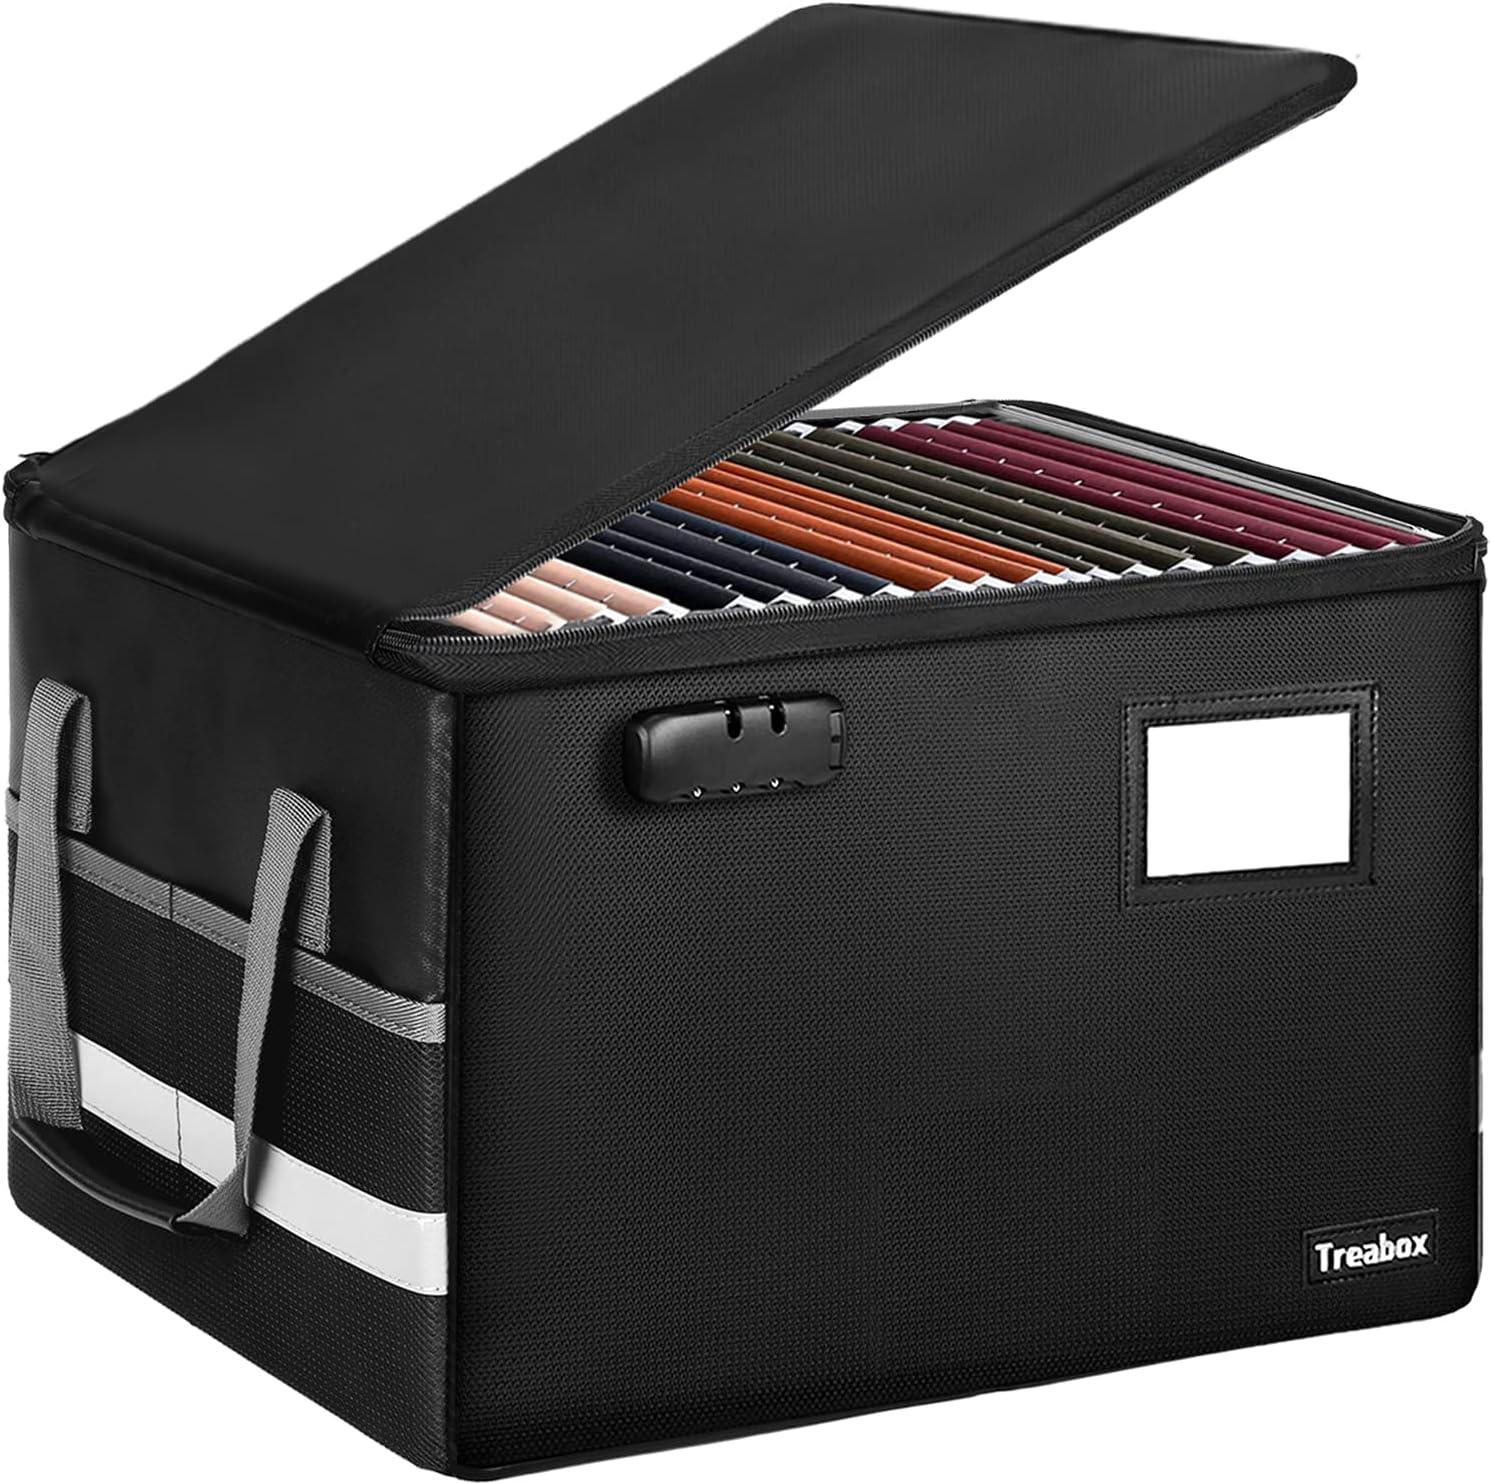 Treabox Fireproof File Storage Box $23.97 Coupon